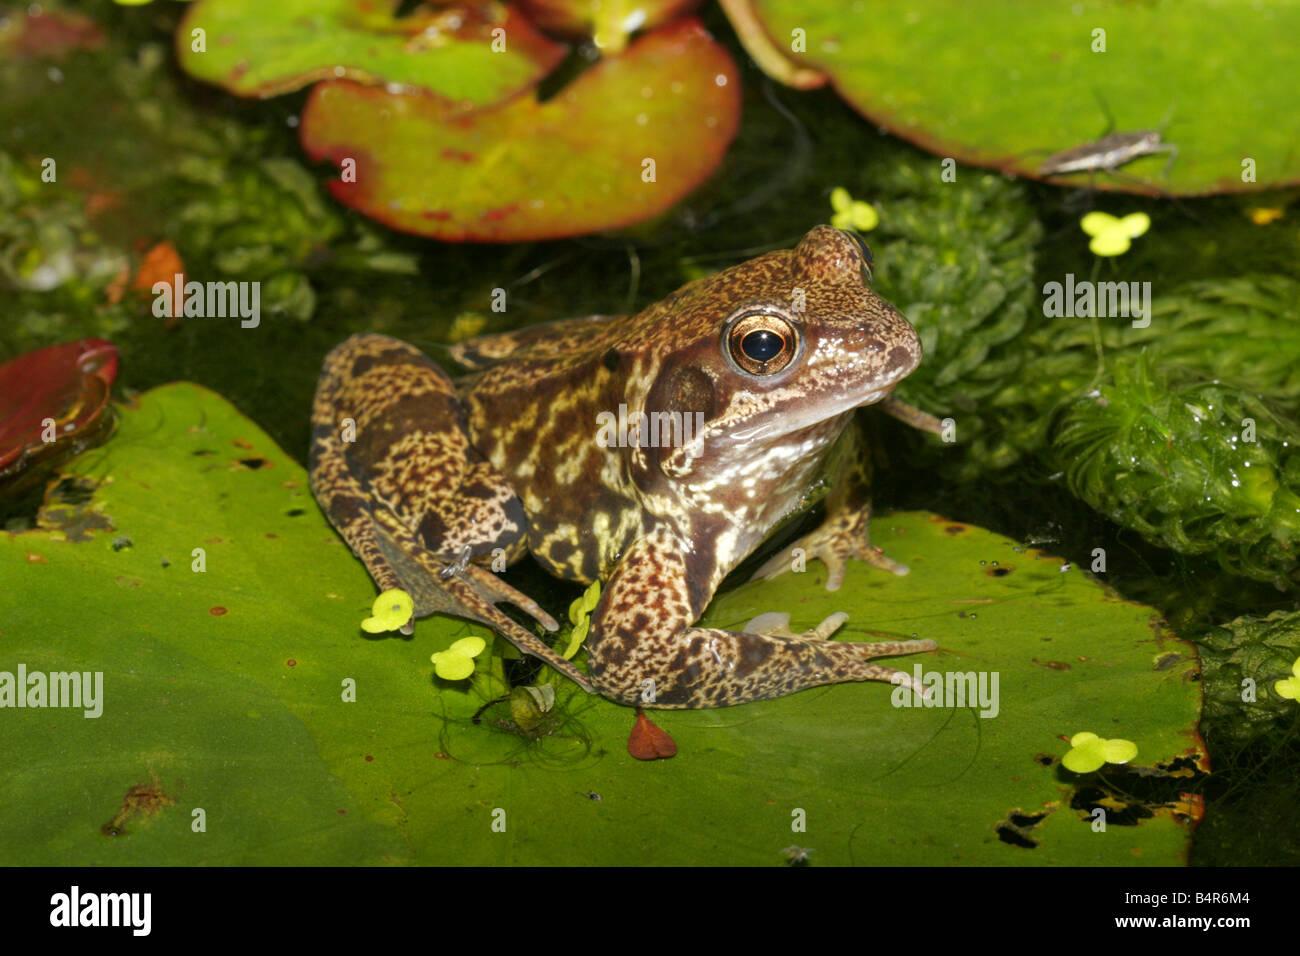 Common Frog Rana temporaria single adult resting on waterlily leaf in garden pond Taken June London UK - Stock Image